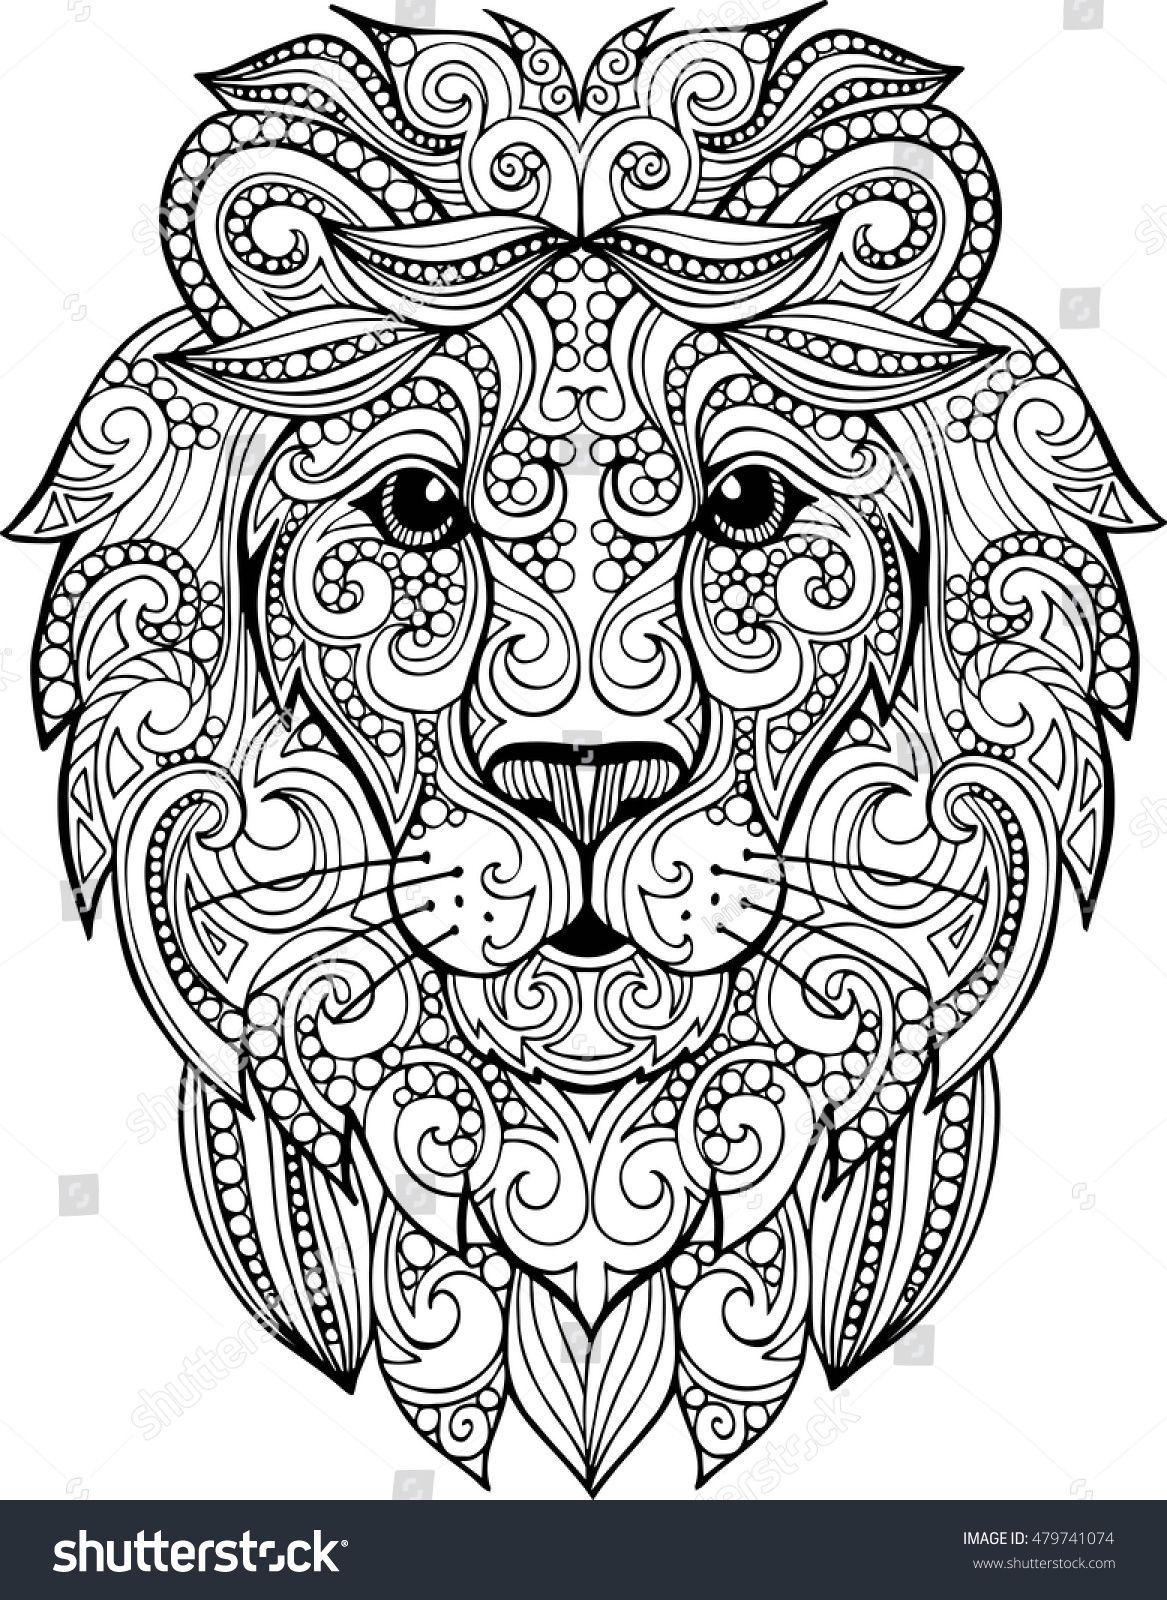 Hand Drawn Doodle Zentangle Lion Illustration Decorative Ornate